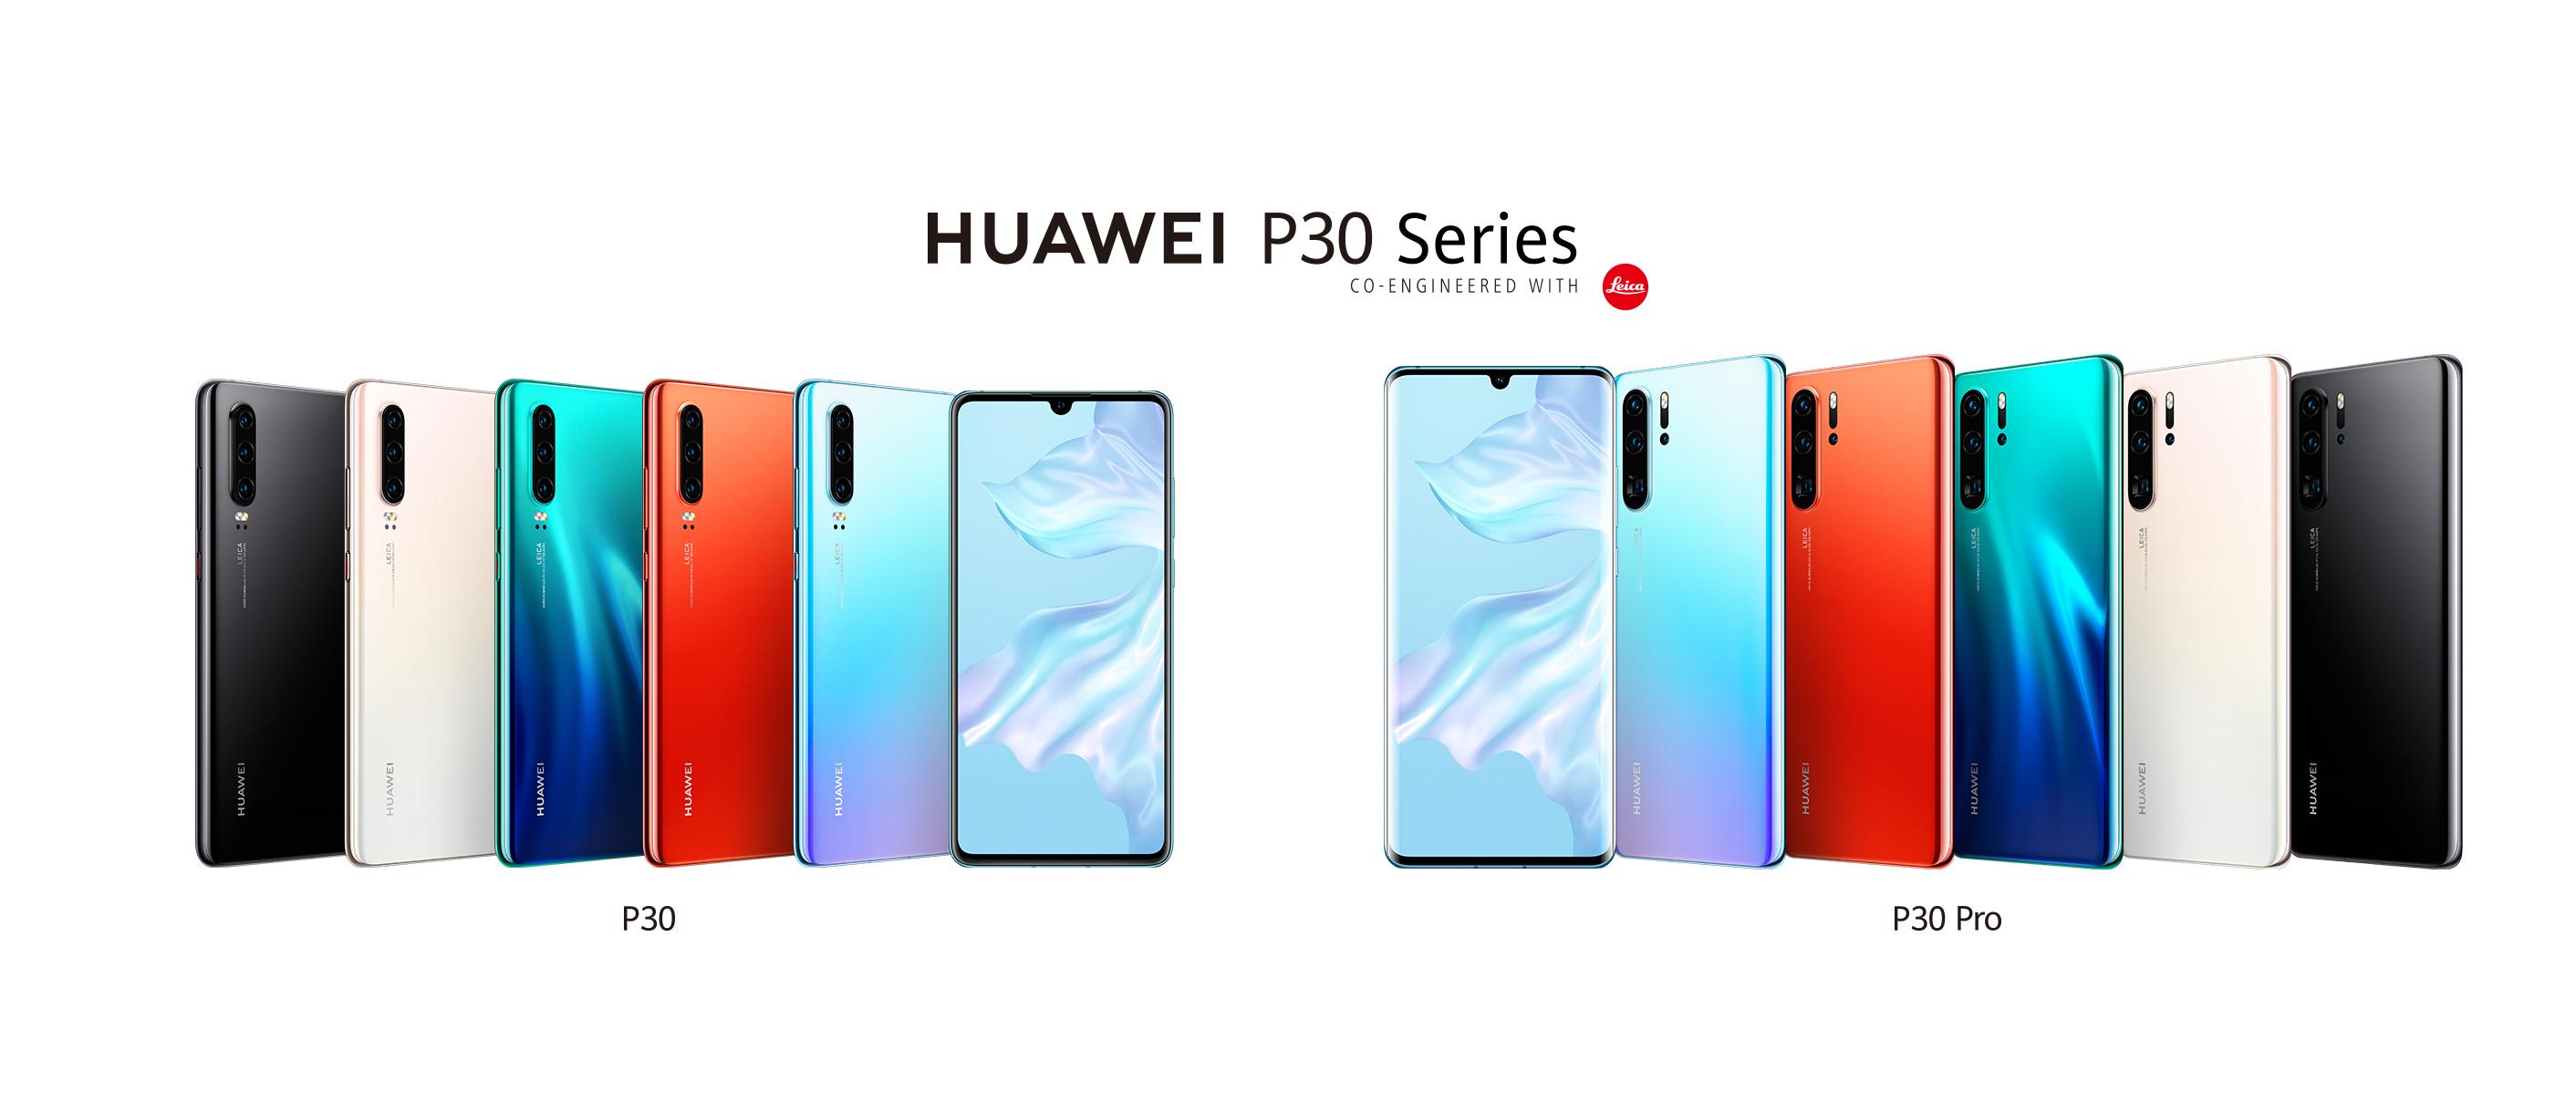 Huawei presentó los HUAWEI P30 y HUAWEI P30 Pro